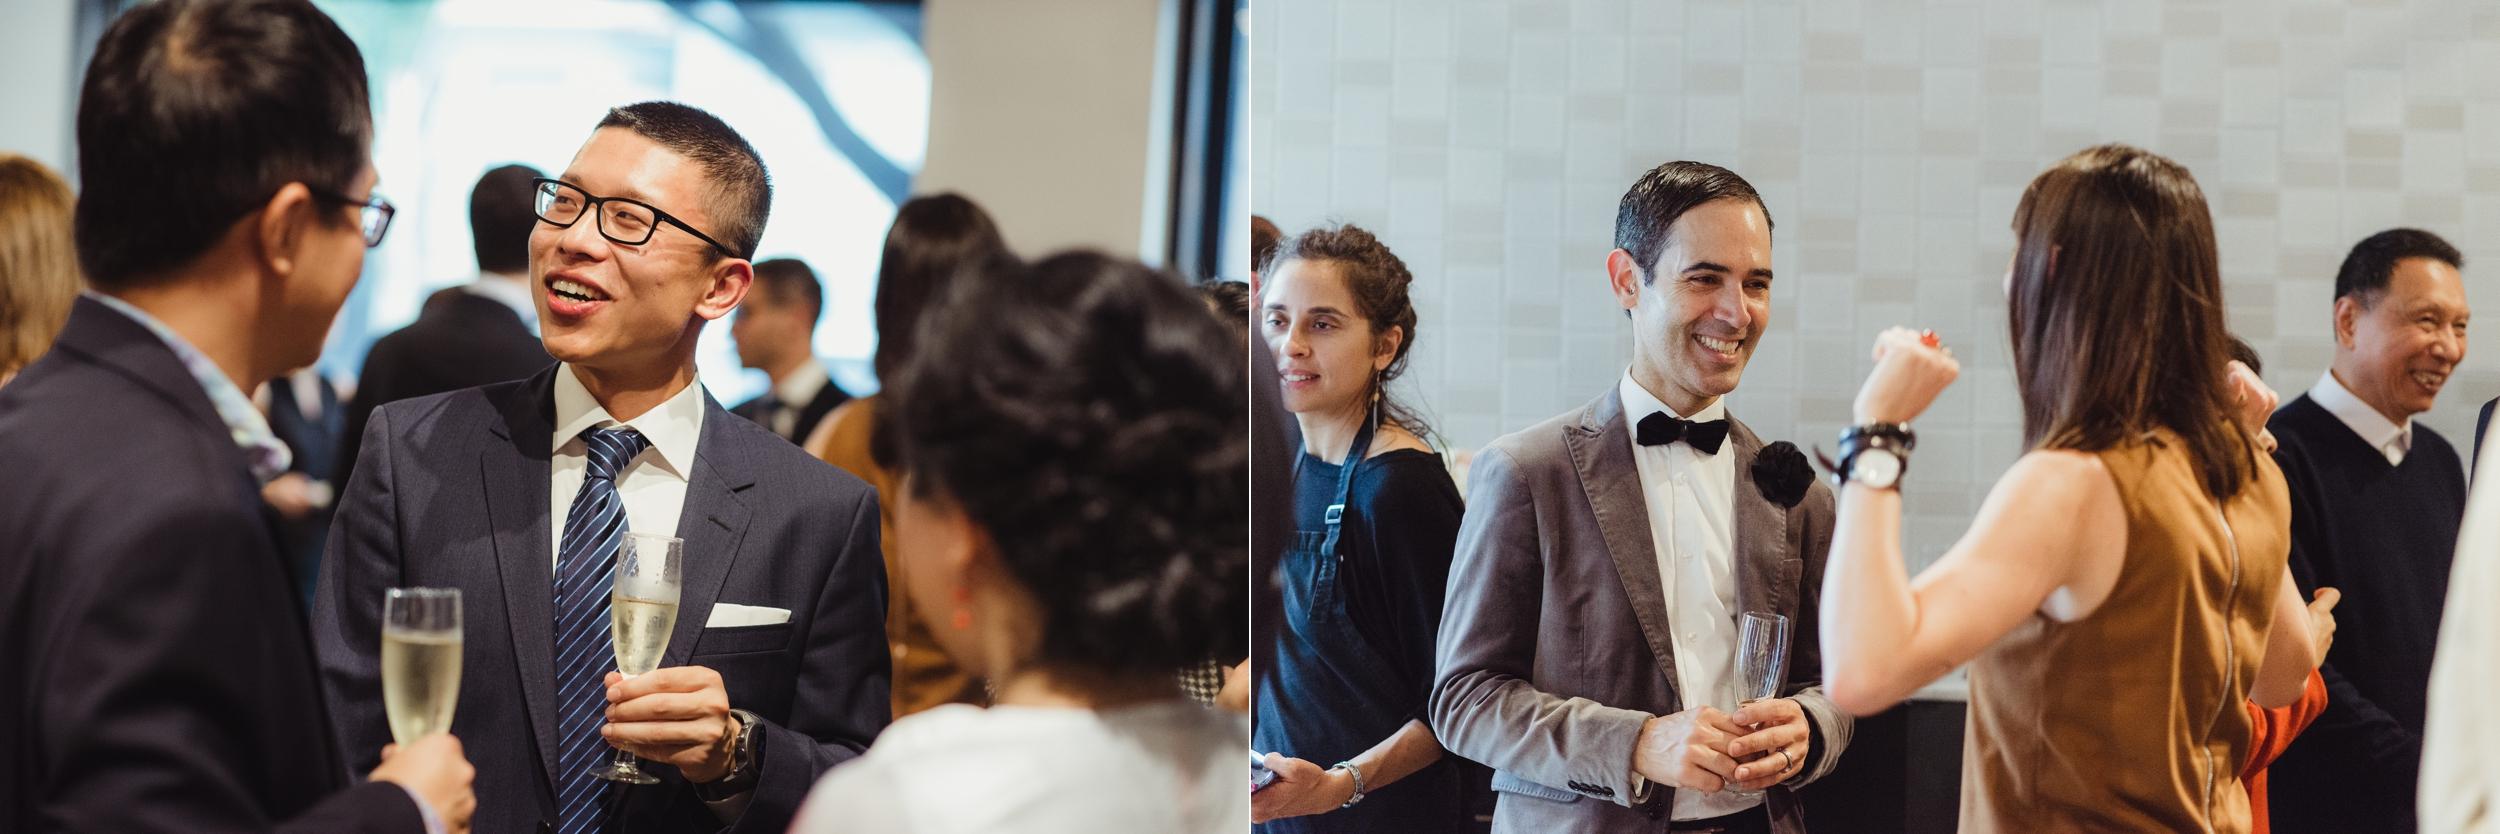 39-sf-city-hall-18-reasons-intimate-wedding-vivianchen-431_WEB.jpg